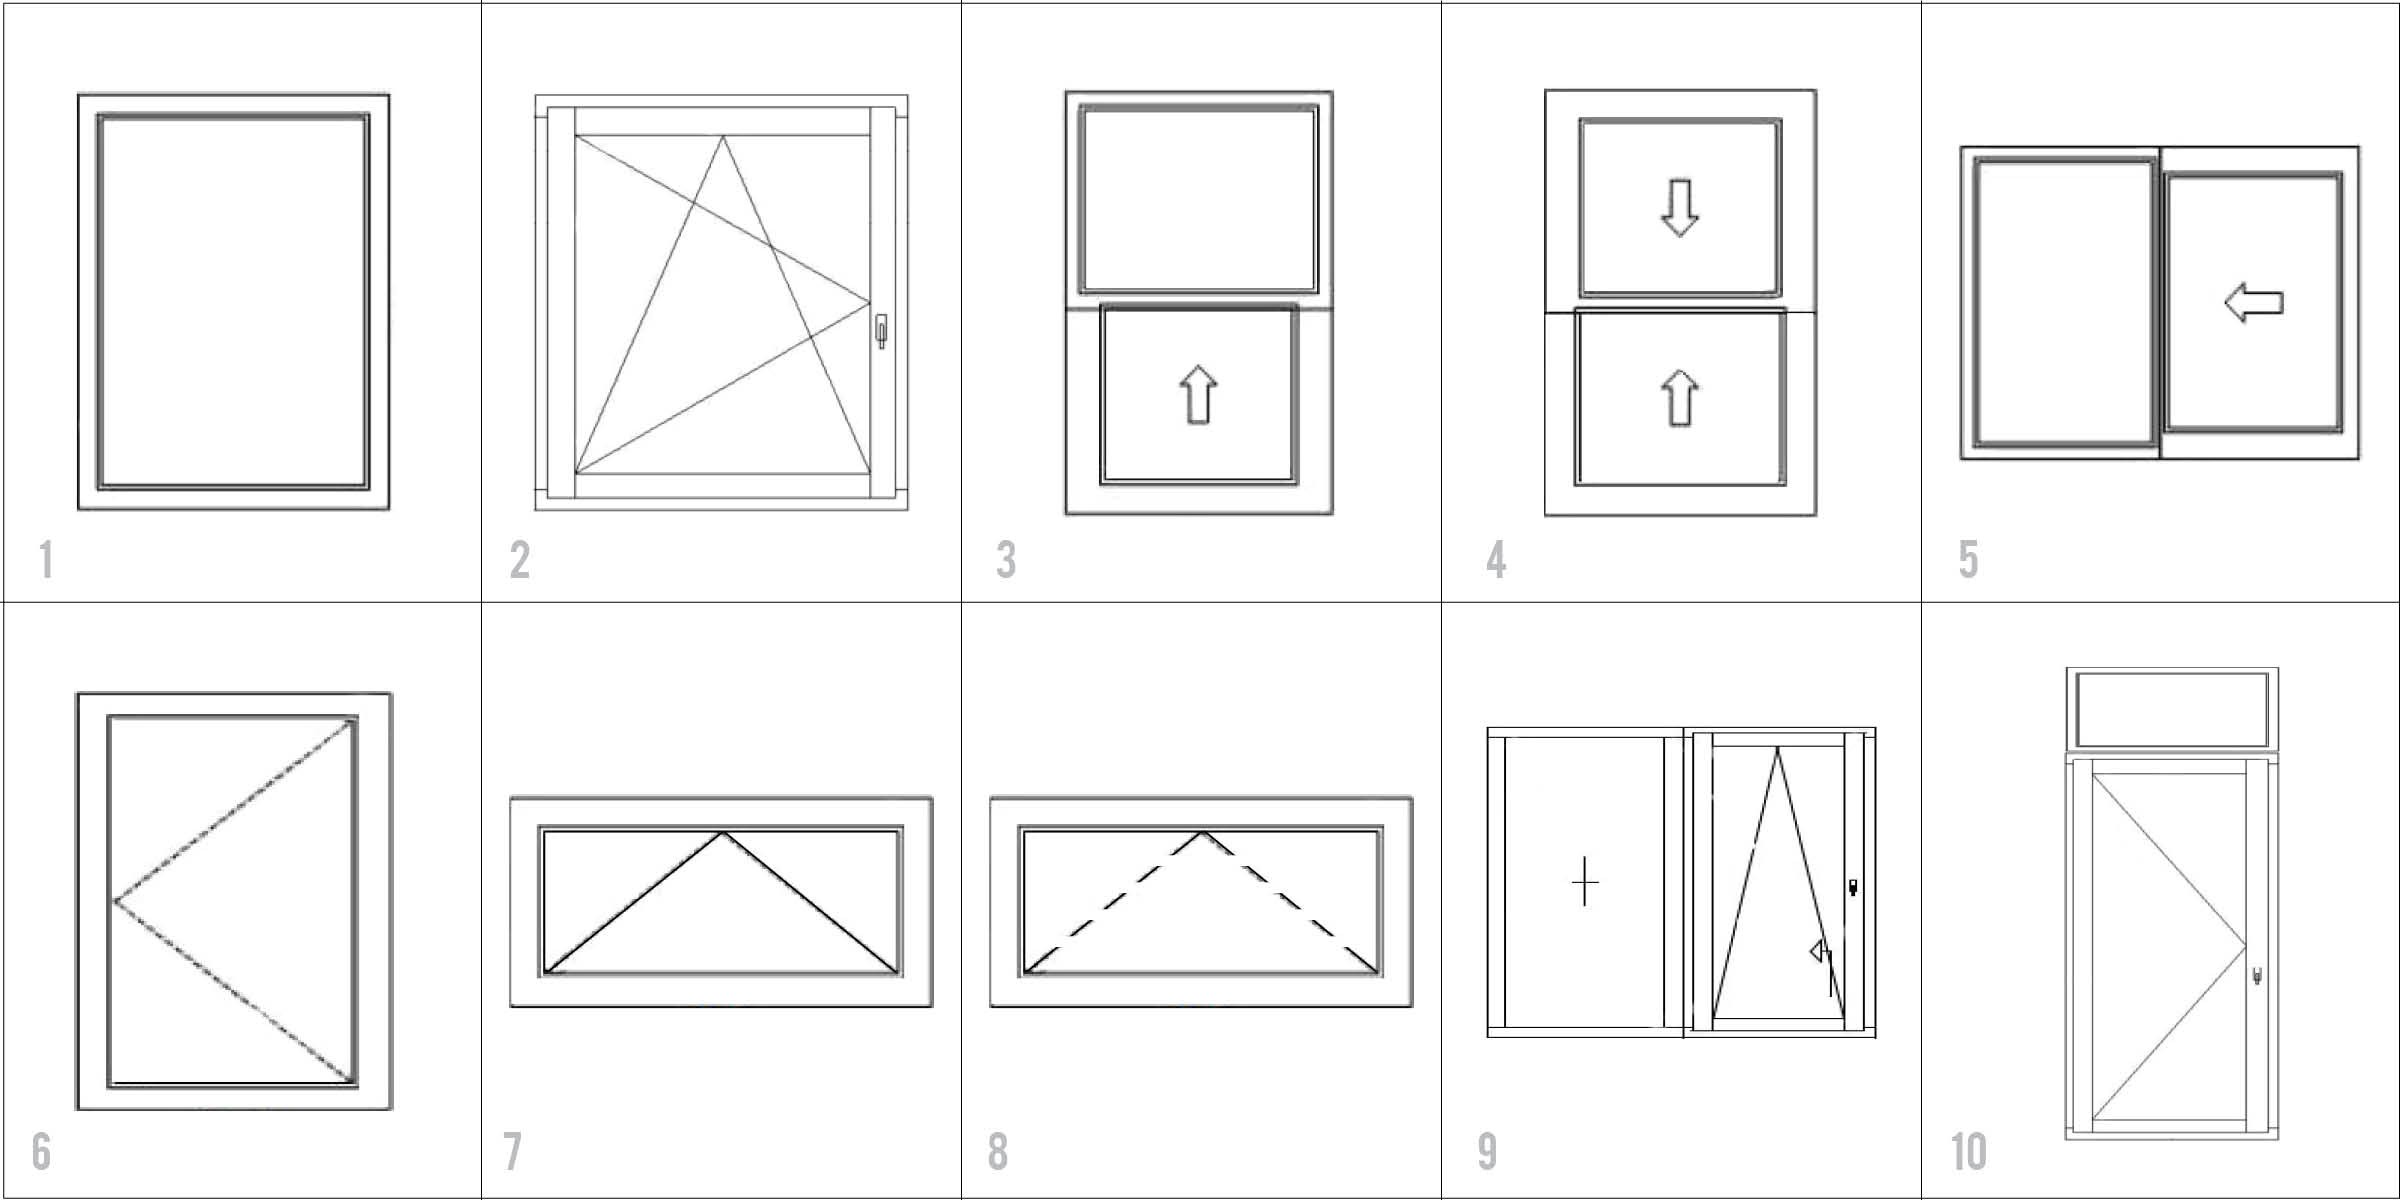 Casement Window Parts Diagram European Window Vs American Window Part 1 Of Casement Window Parts Diagram